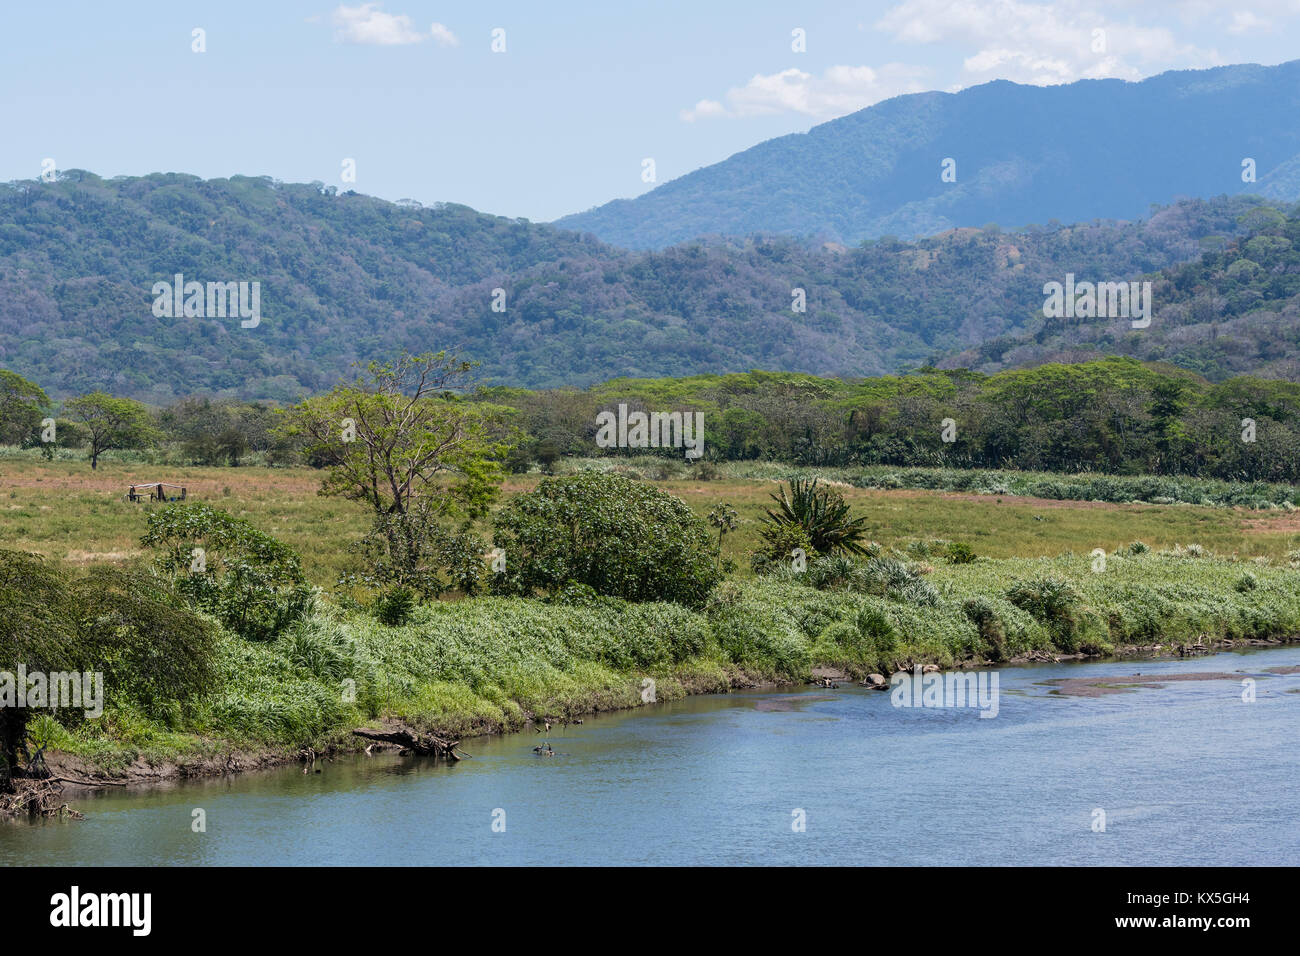 Rio Tarcoles, Carara National Park, province Puntarenas, Costa Rica - Stock Image